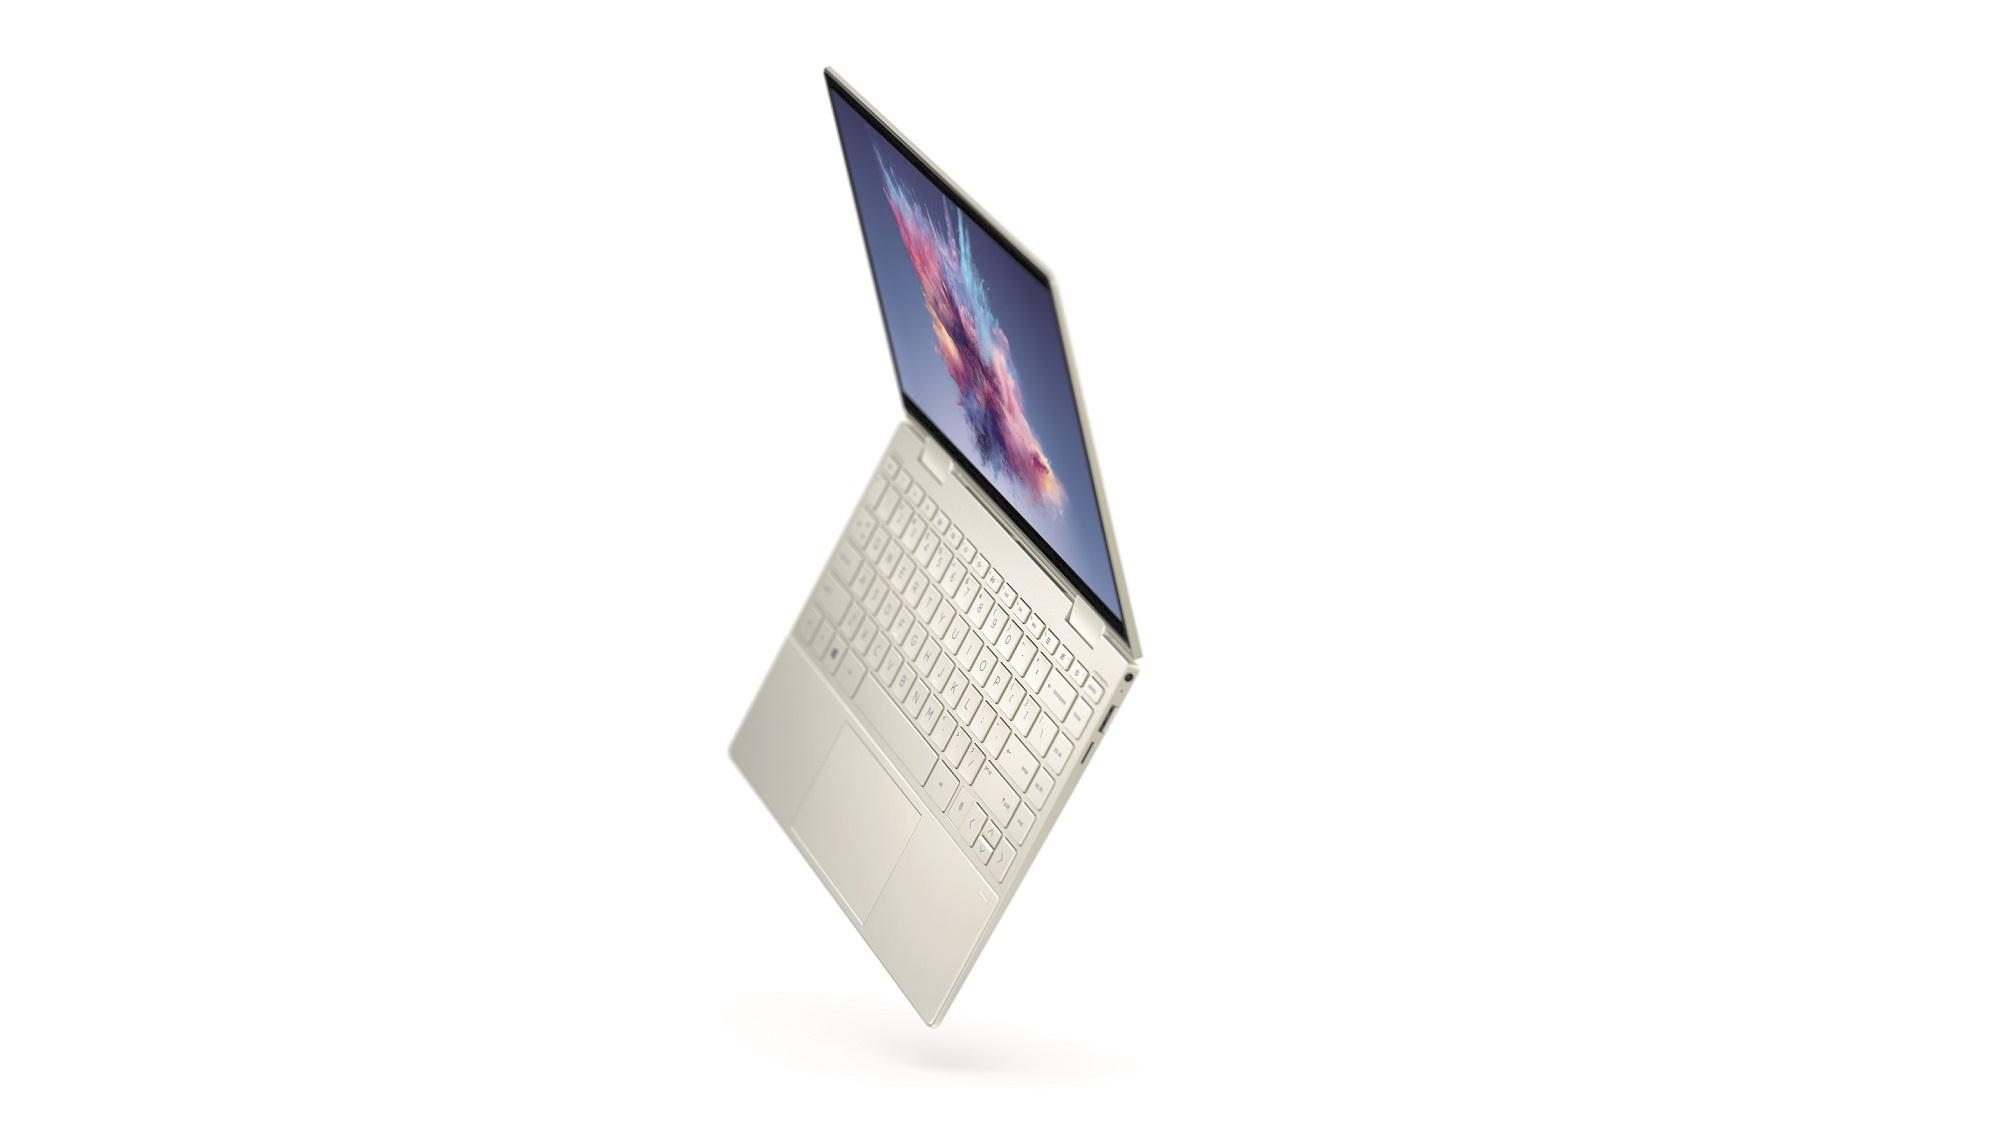 HP ENVY x360 13 PaleGold